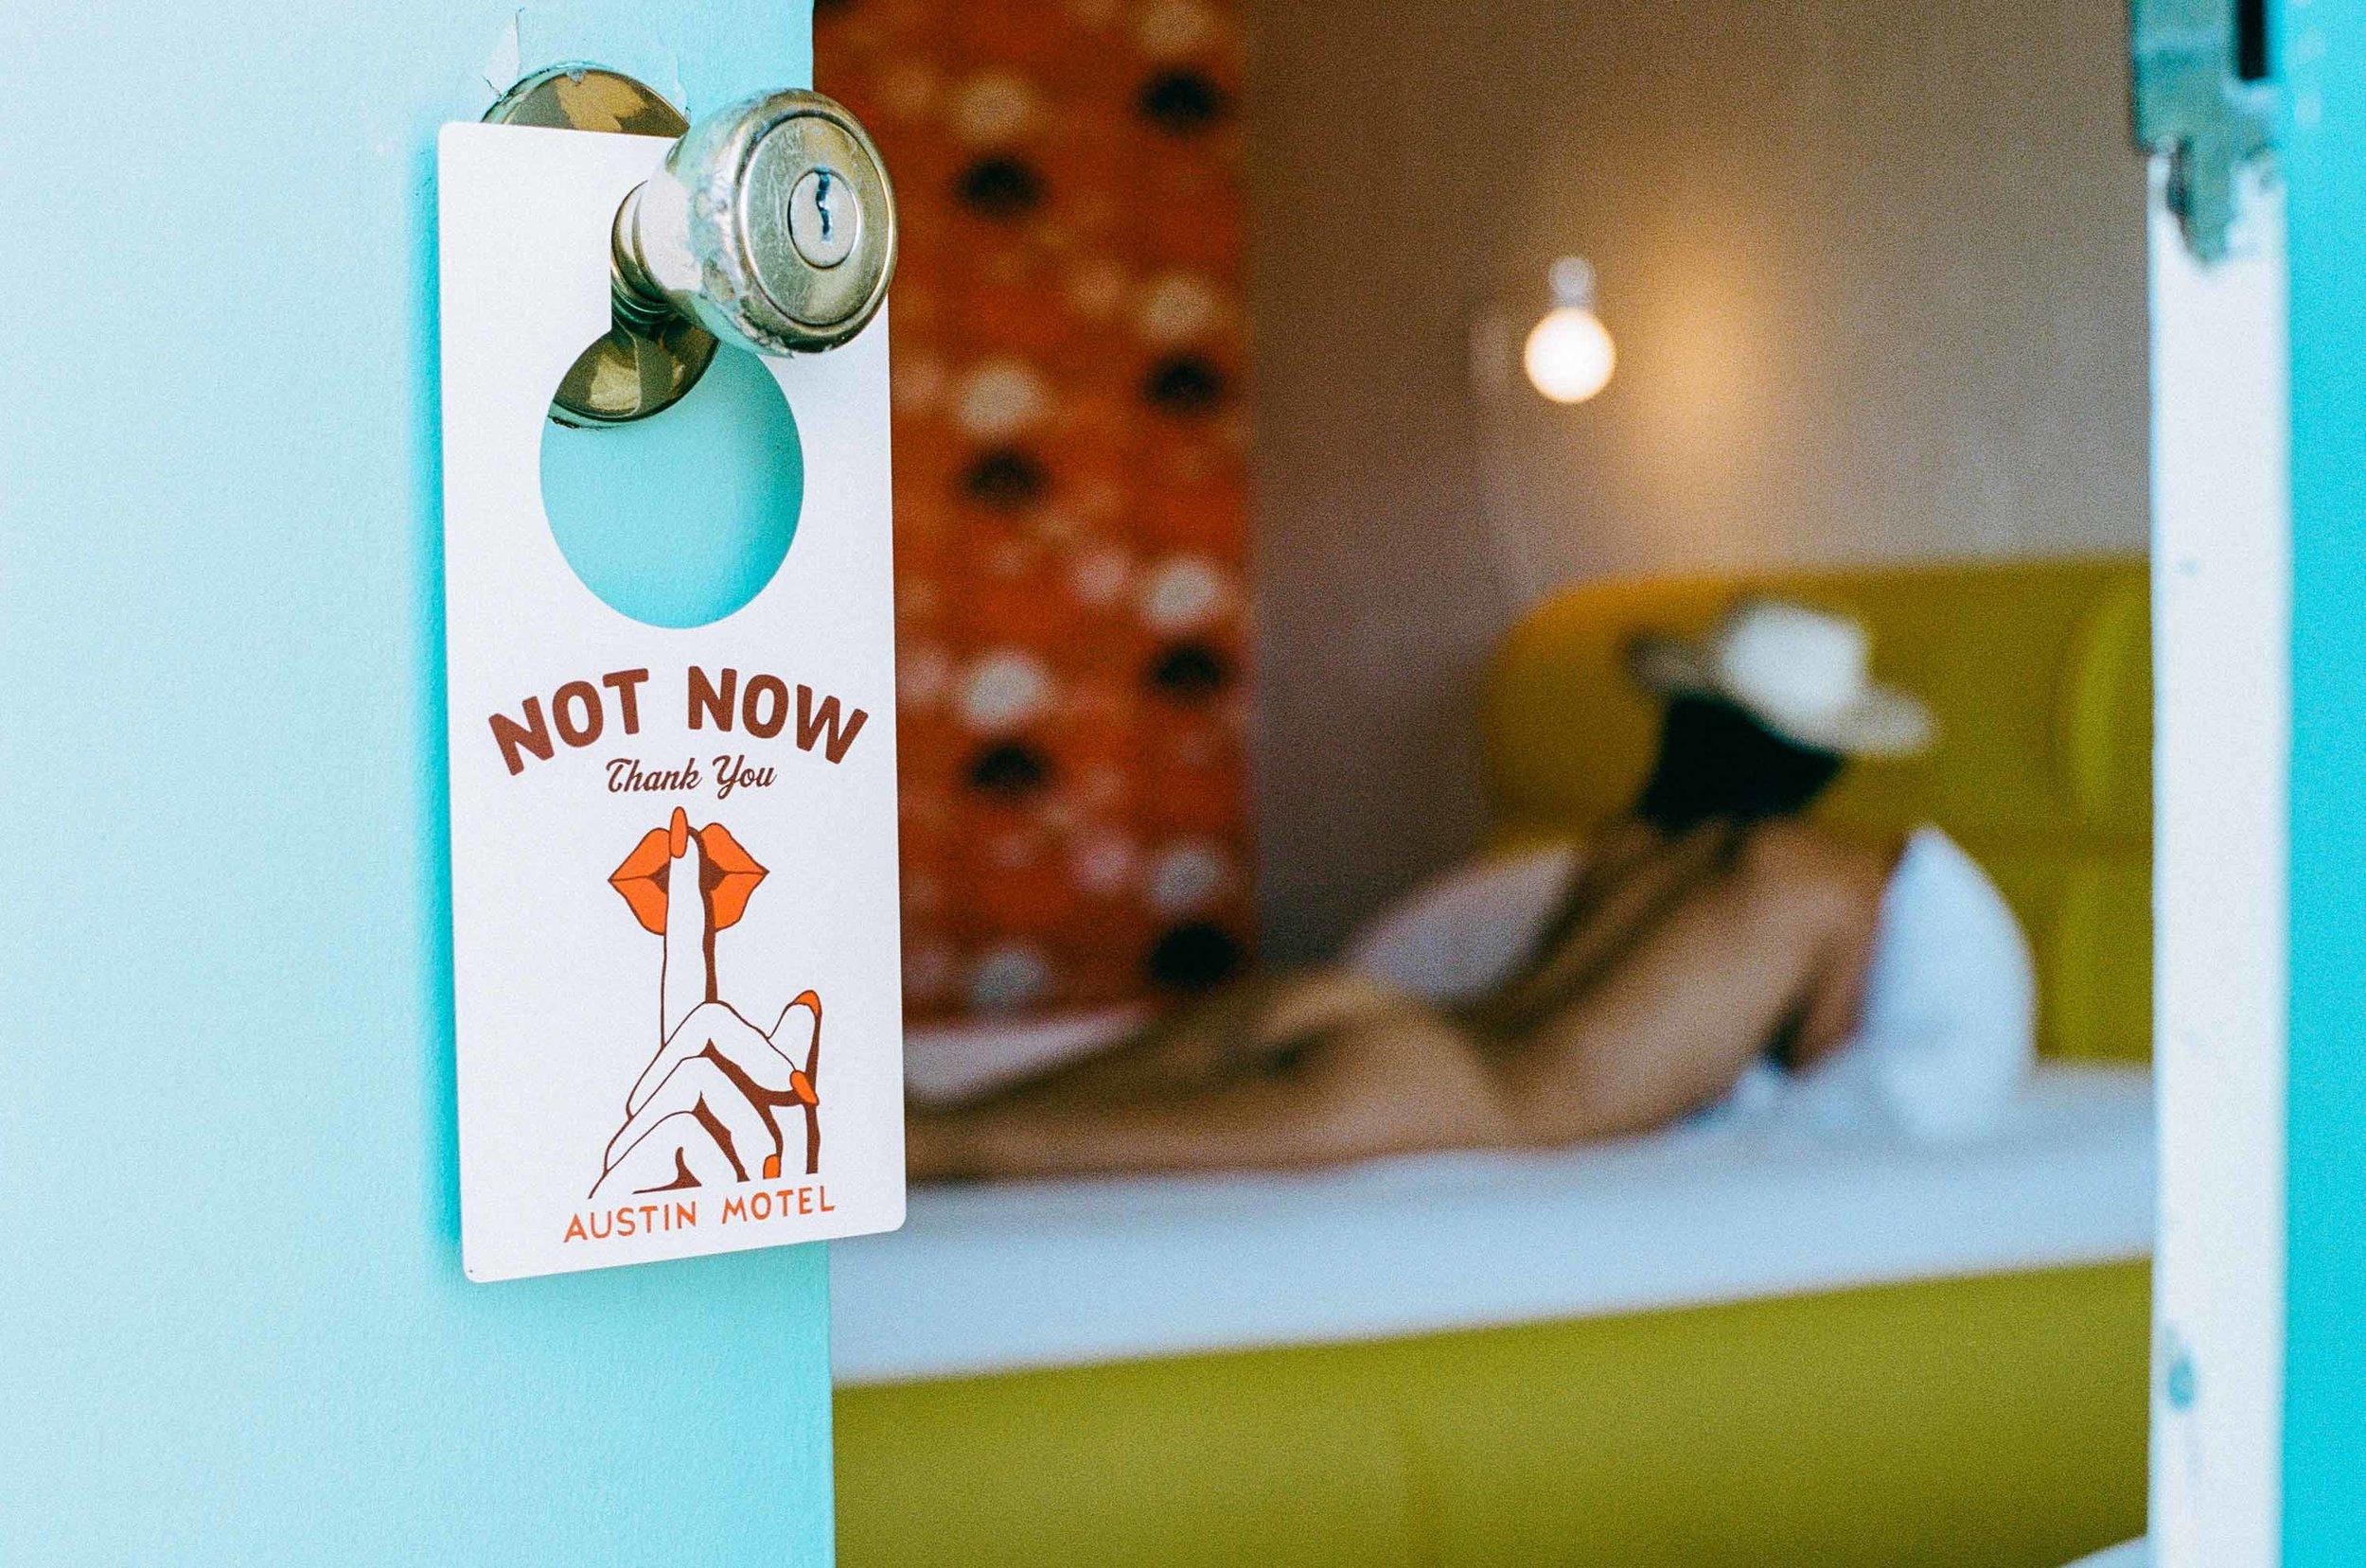 Austin Motel_WebRes_HunterHolder_3.jpg